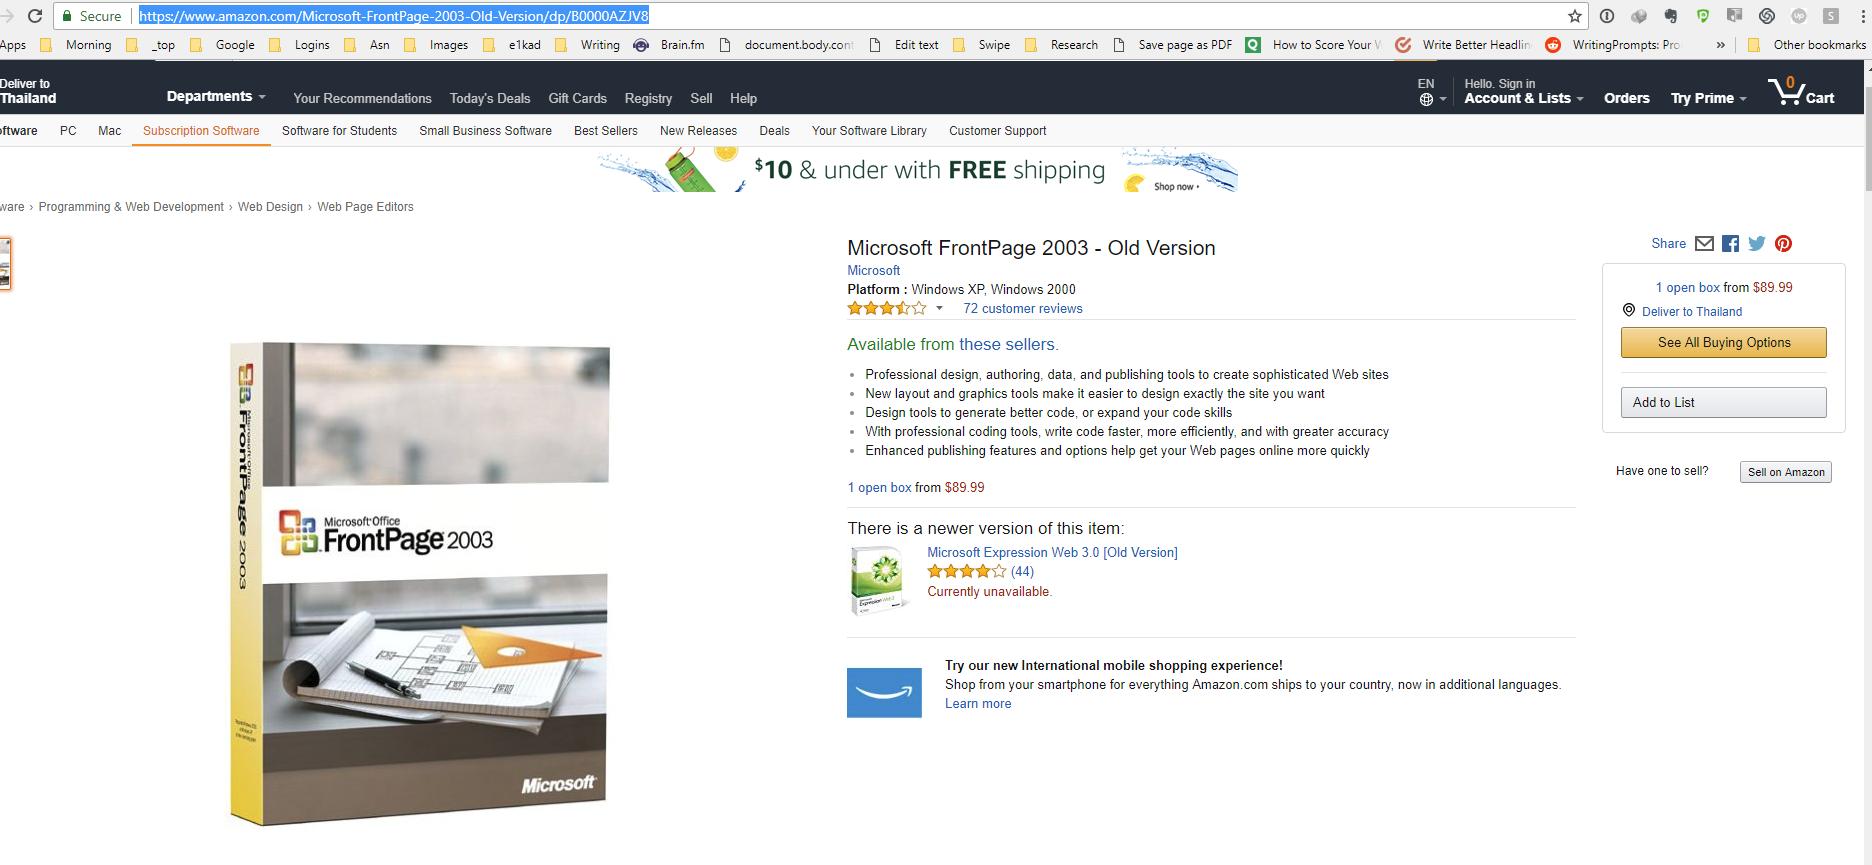 Amazon Microsoft FrontPage 2003